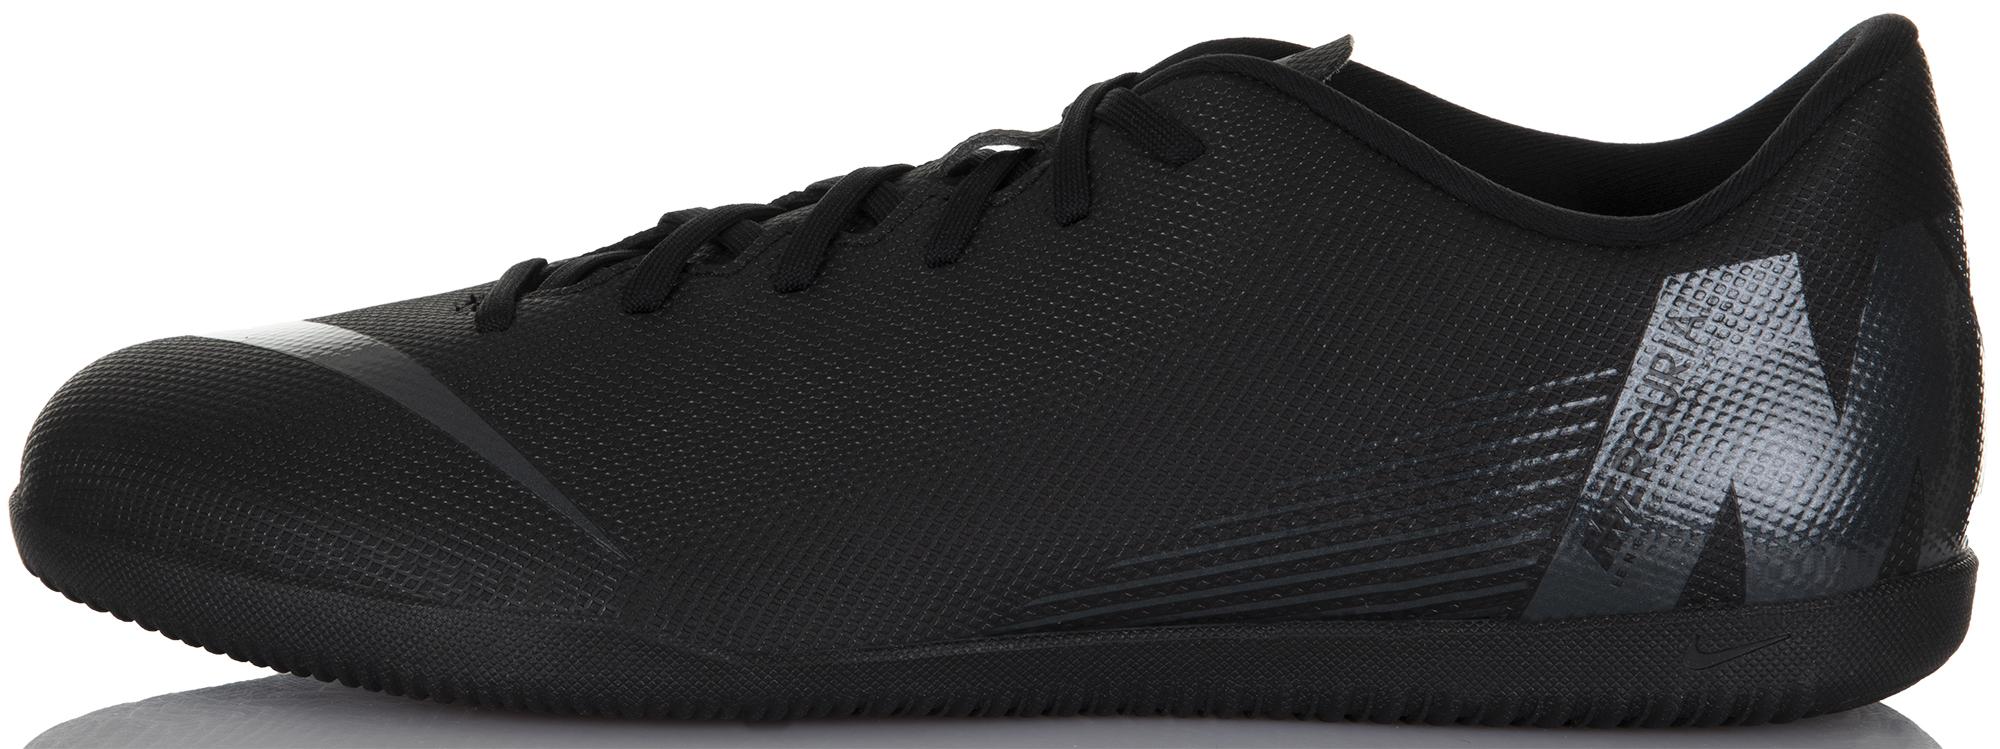 Nike Бутсы мужские Nike VaporX 12 Club IC, размер 44